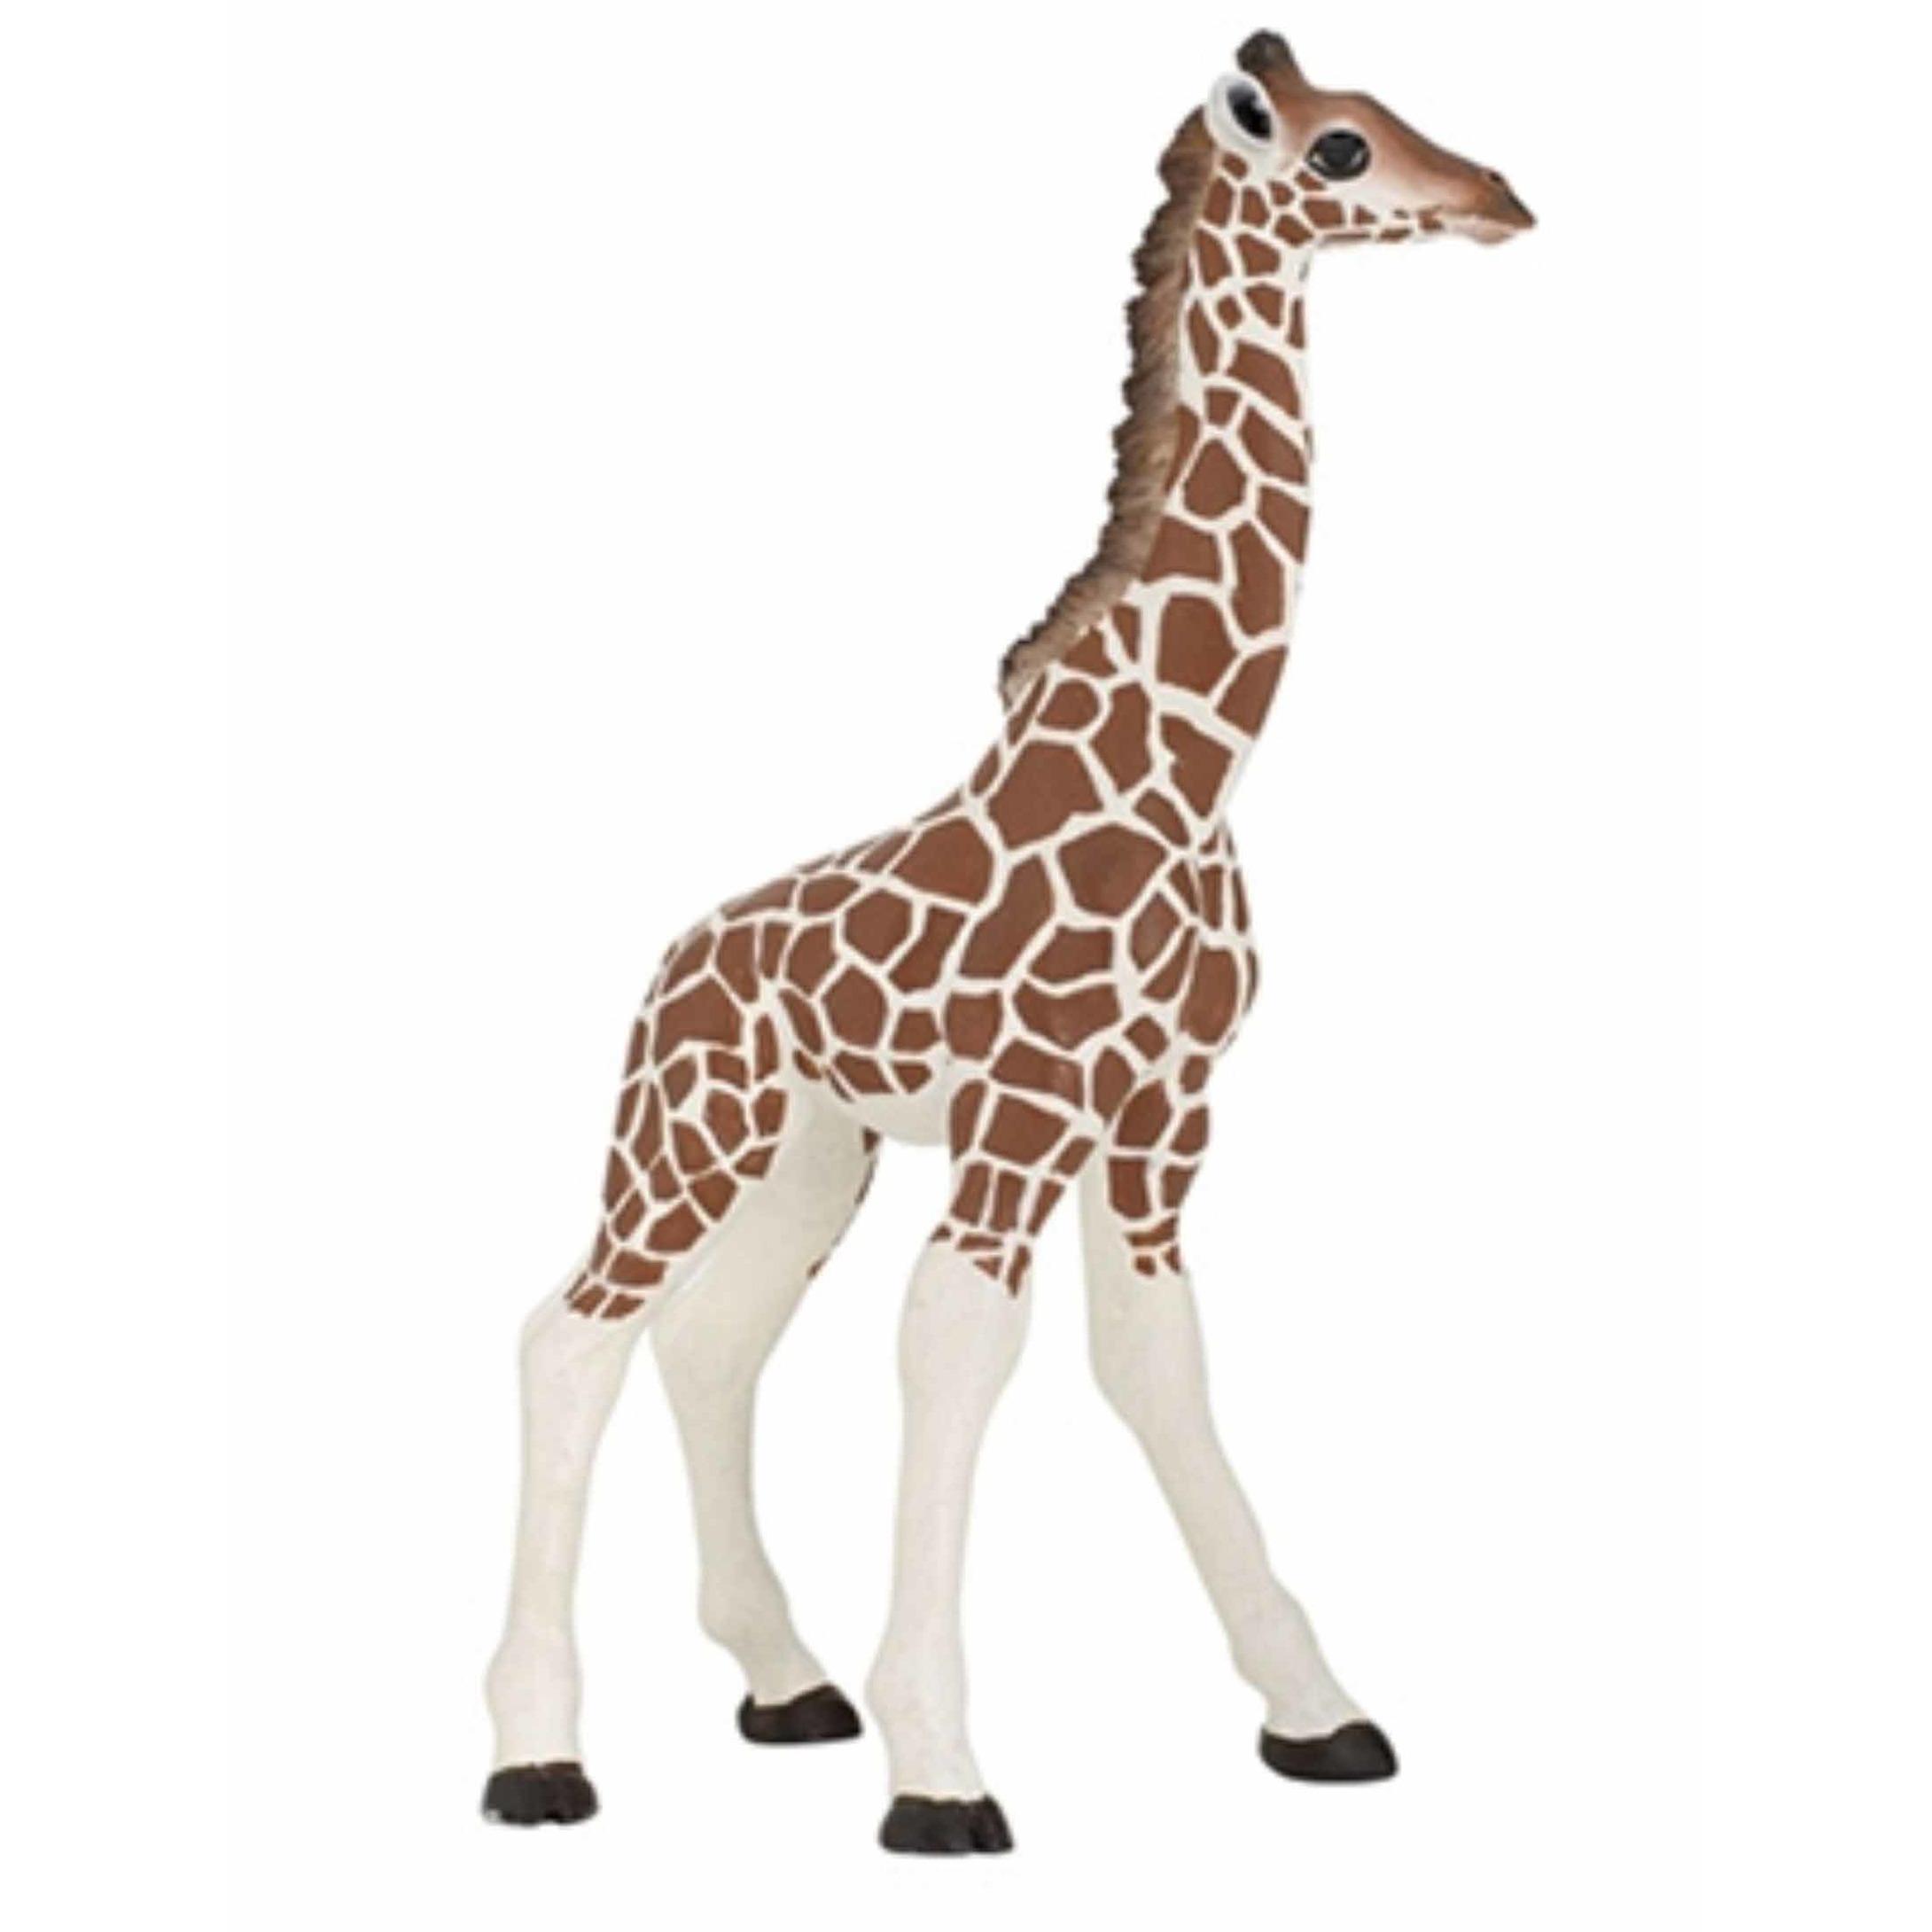 Image of Plastic baby giraffe 9 cm